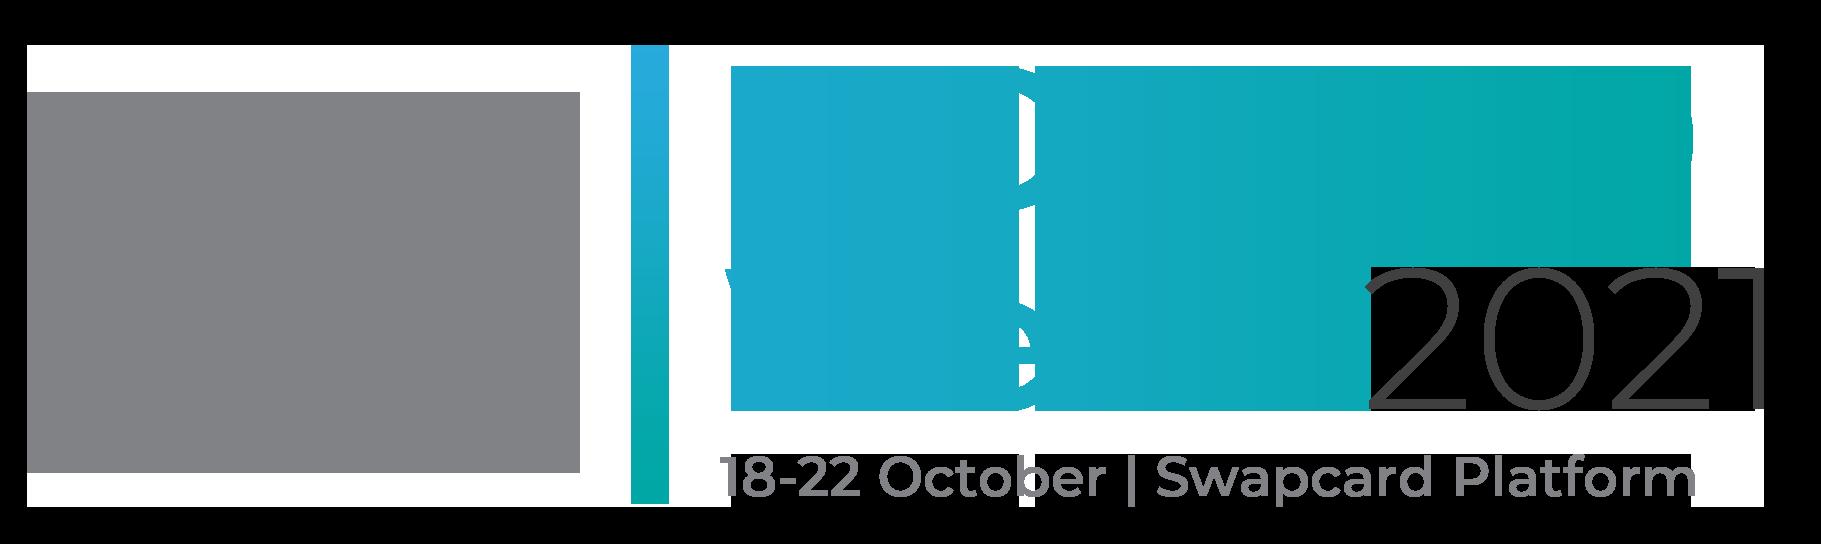 DERlab partners with IEC 61850 Week 2021